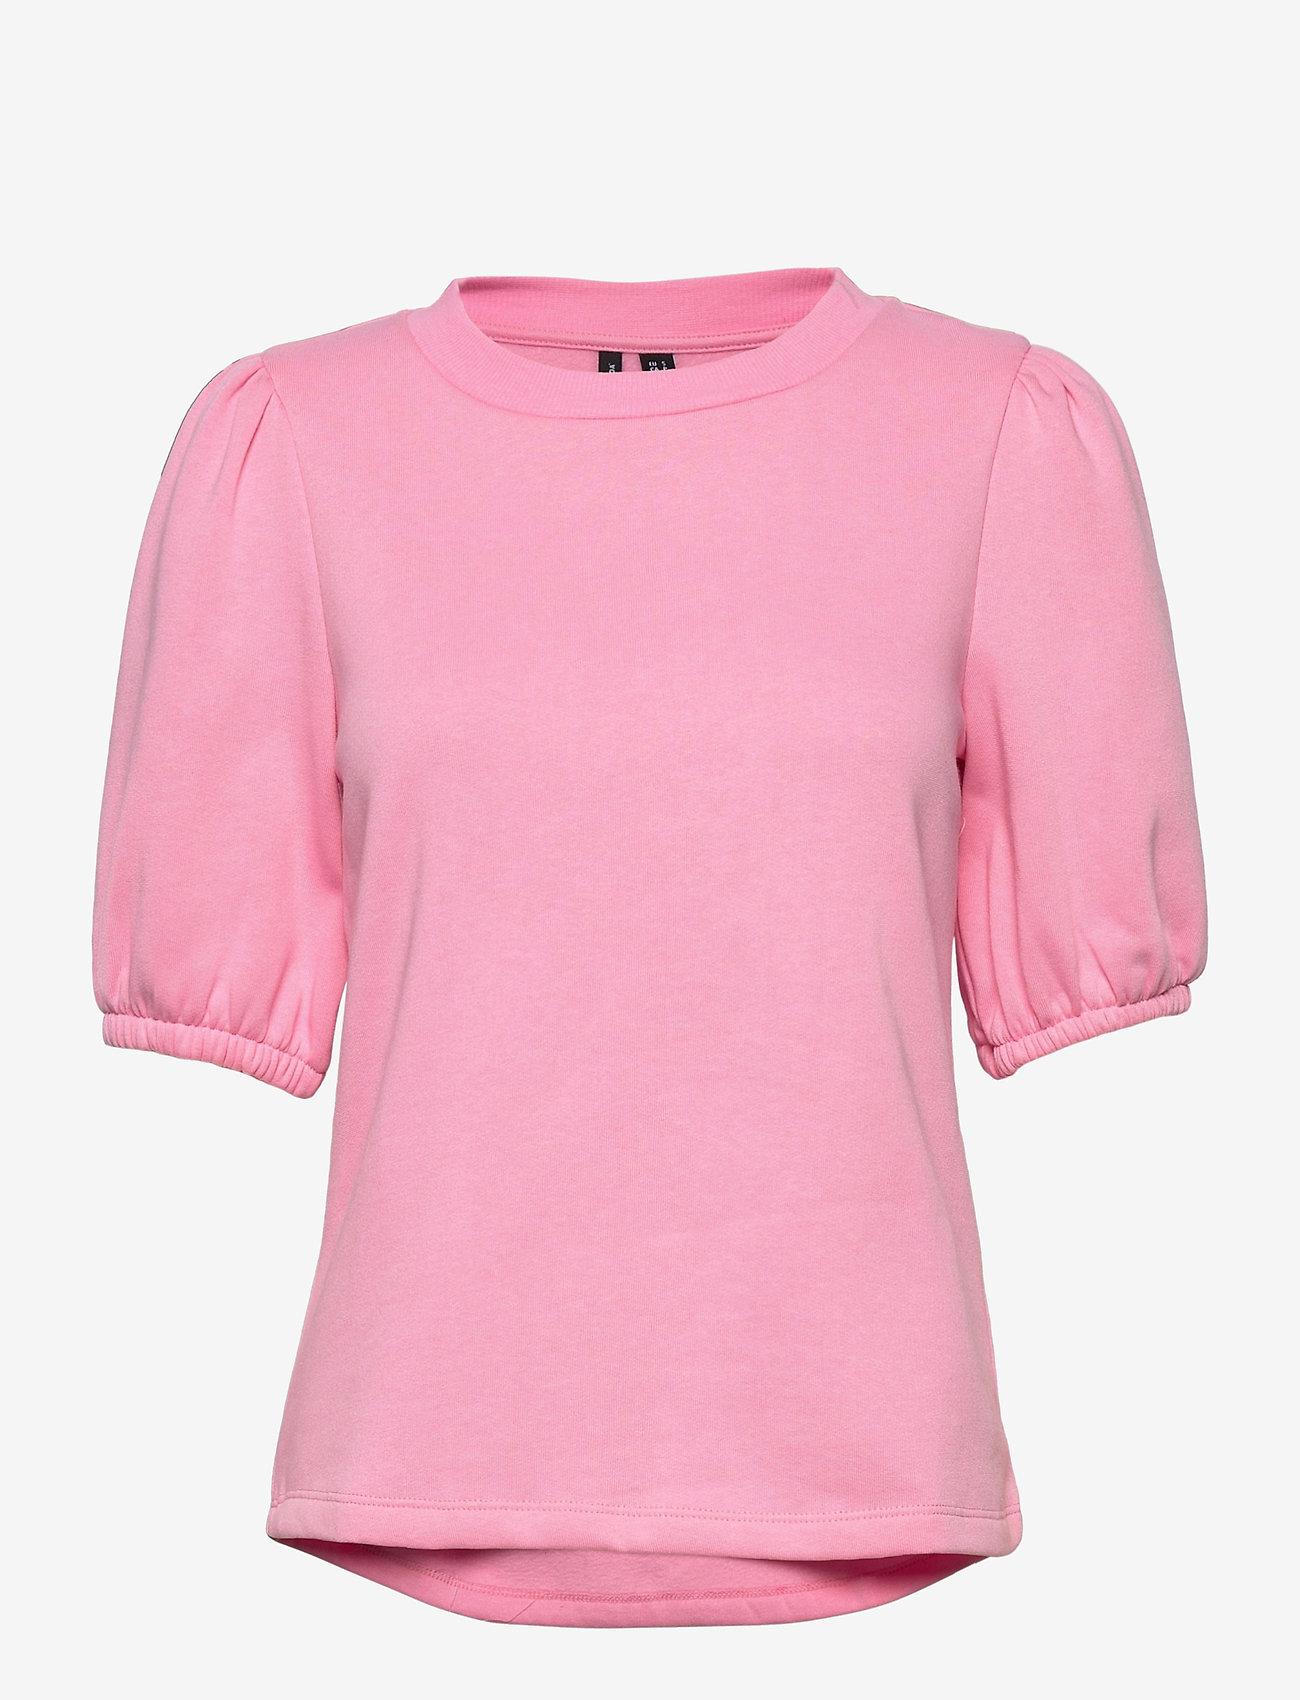 Vero Moda - VMDAISY S/S SWEAT EXP - långärmade blusar - prism pink - 0